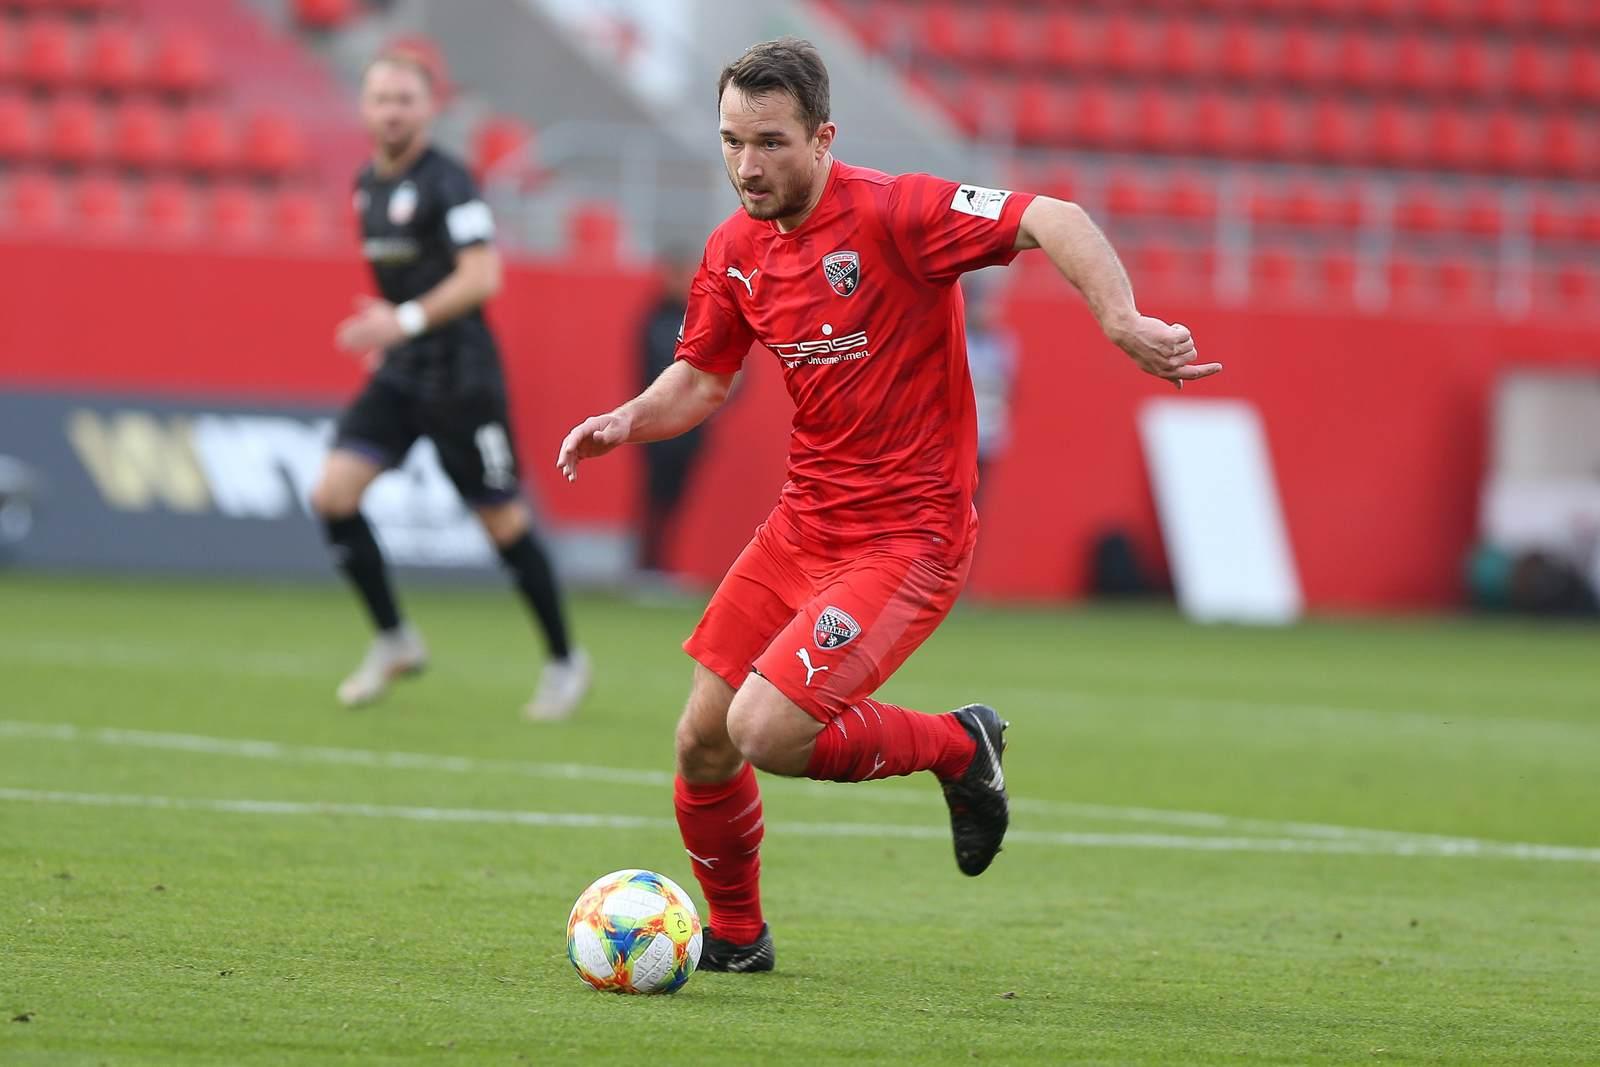 Peter Kurzweg vom FC Ingolstadt